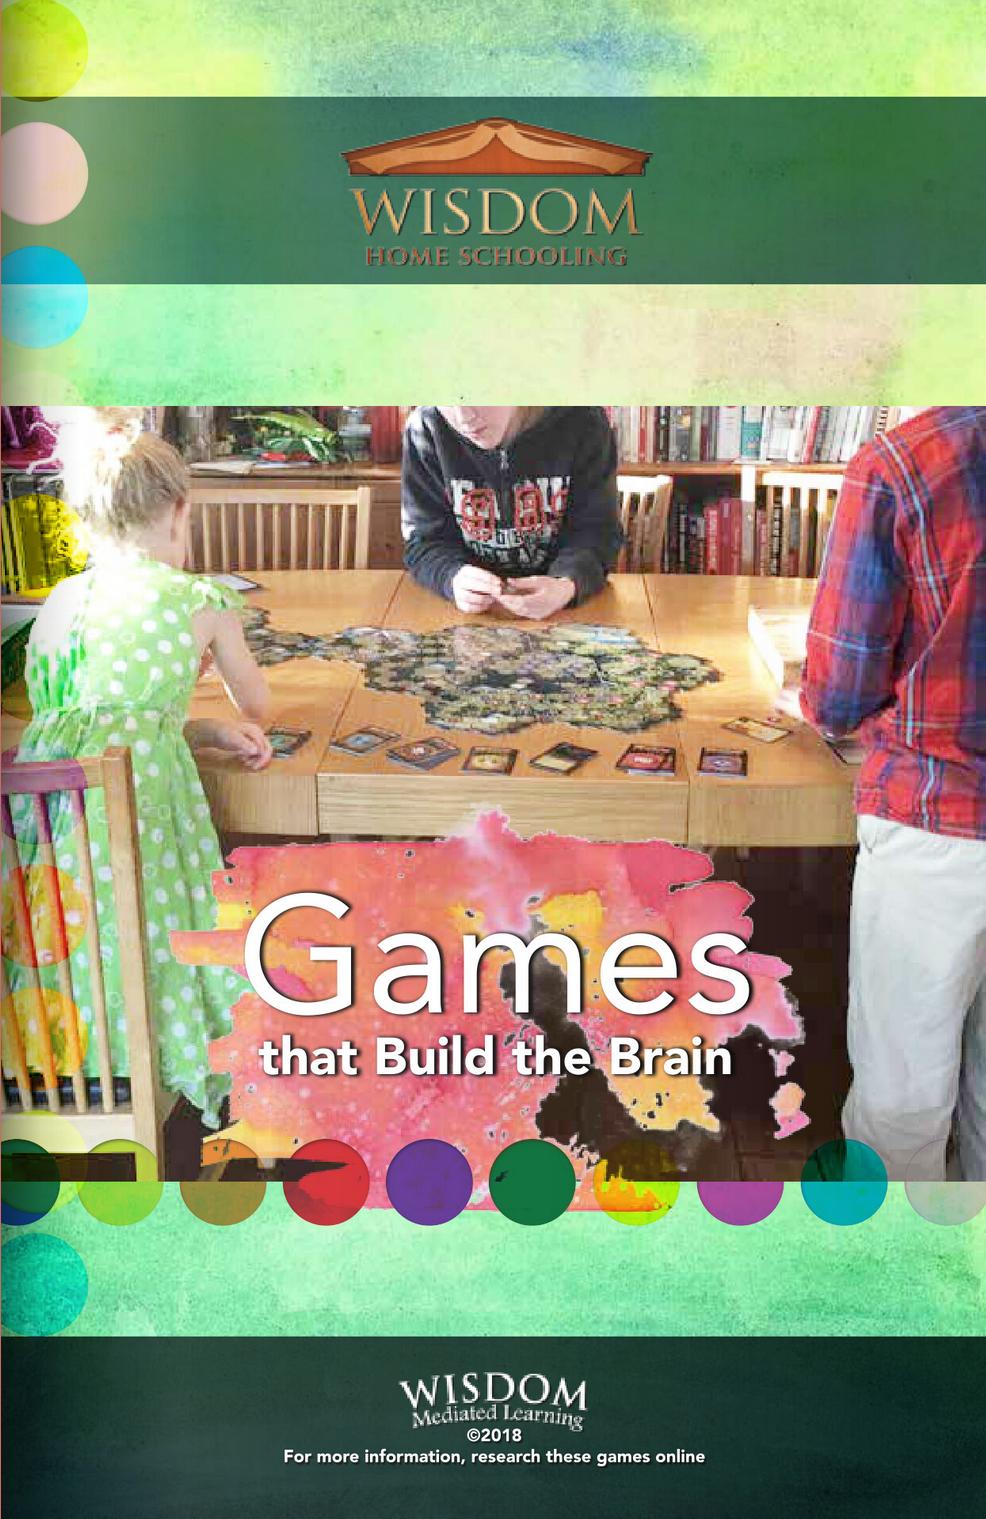 gamesthatbuildthebrain